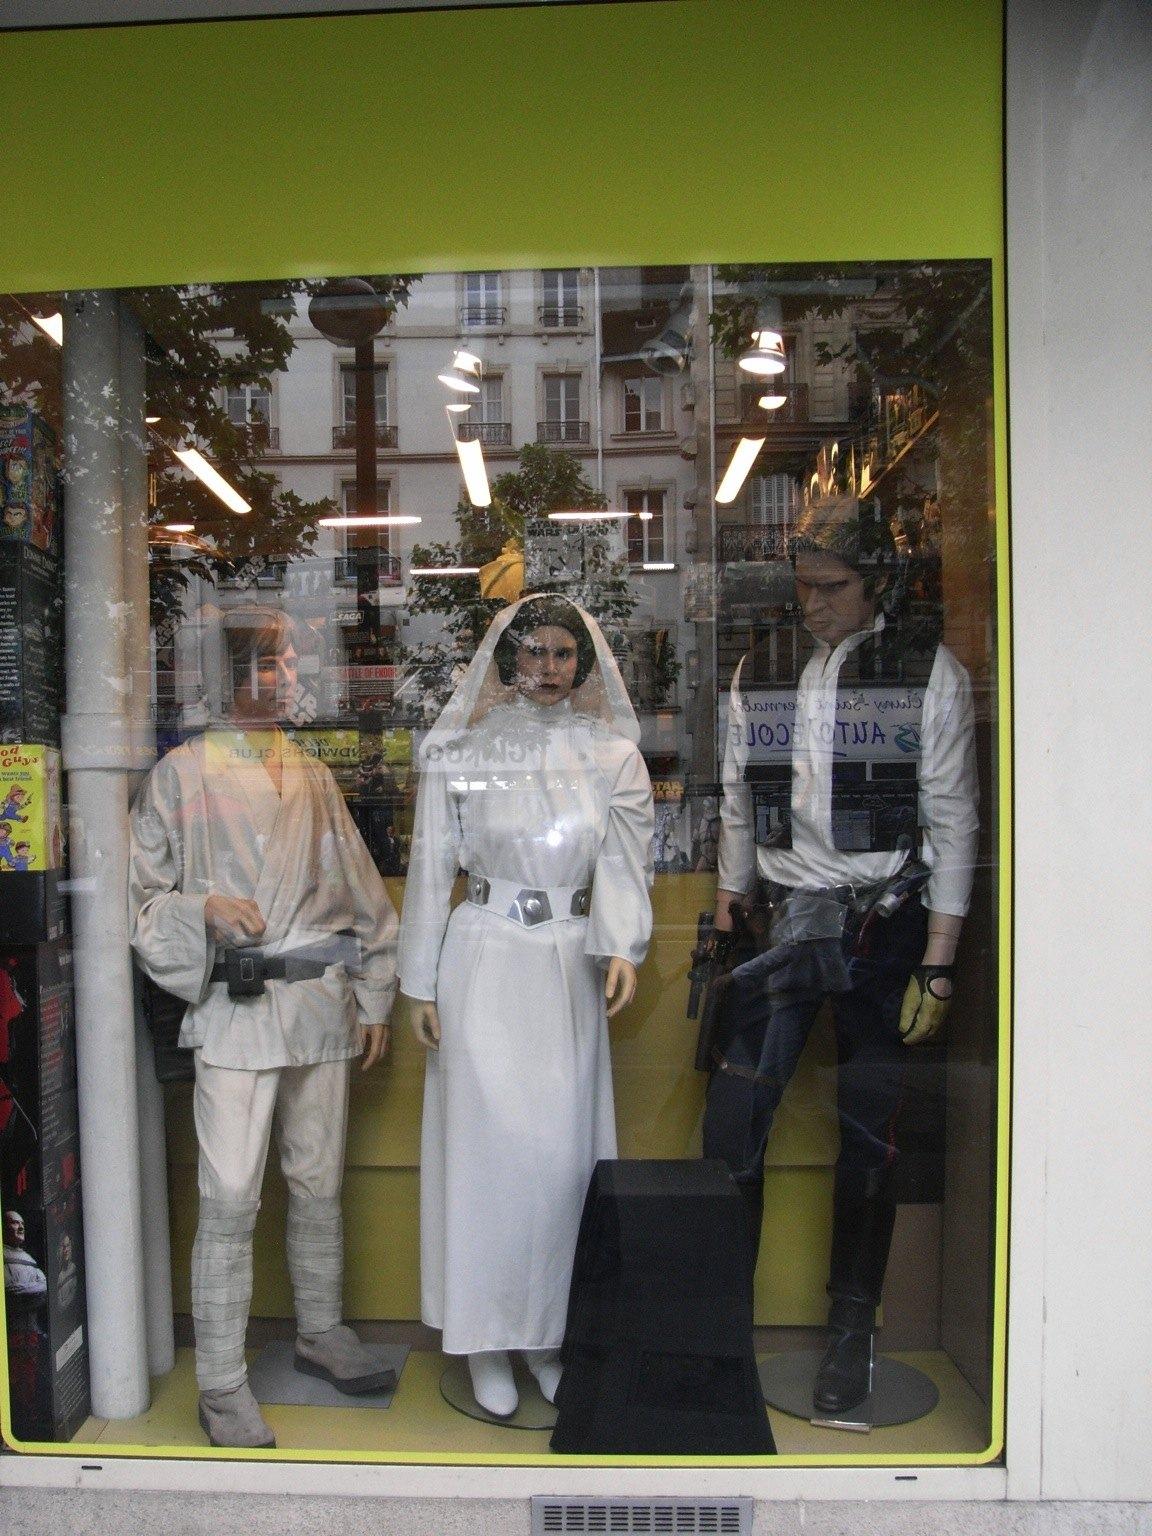 Photo 16 - Luke, Leia et Han (on sait jamais, lol!)